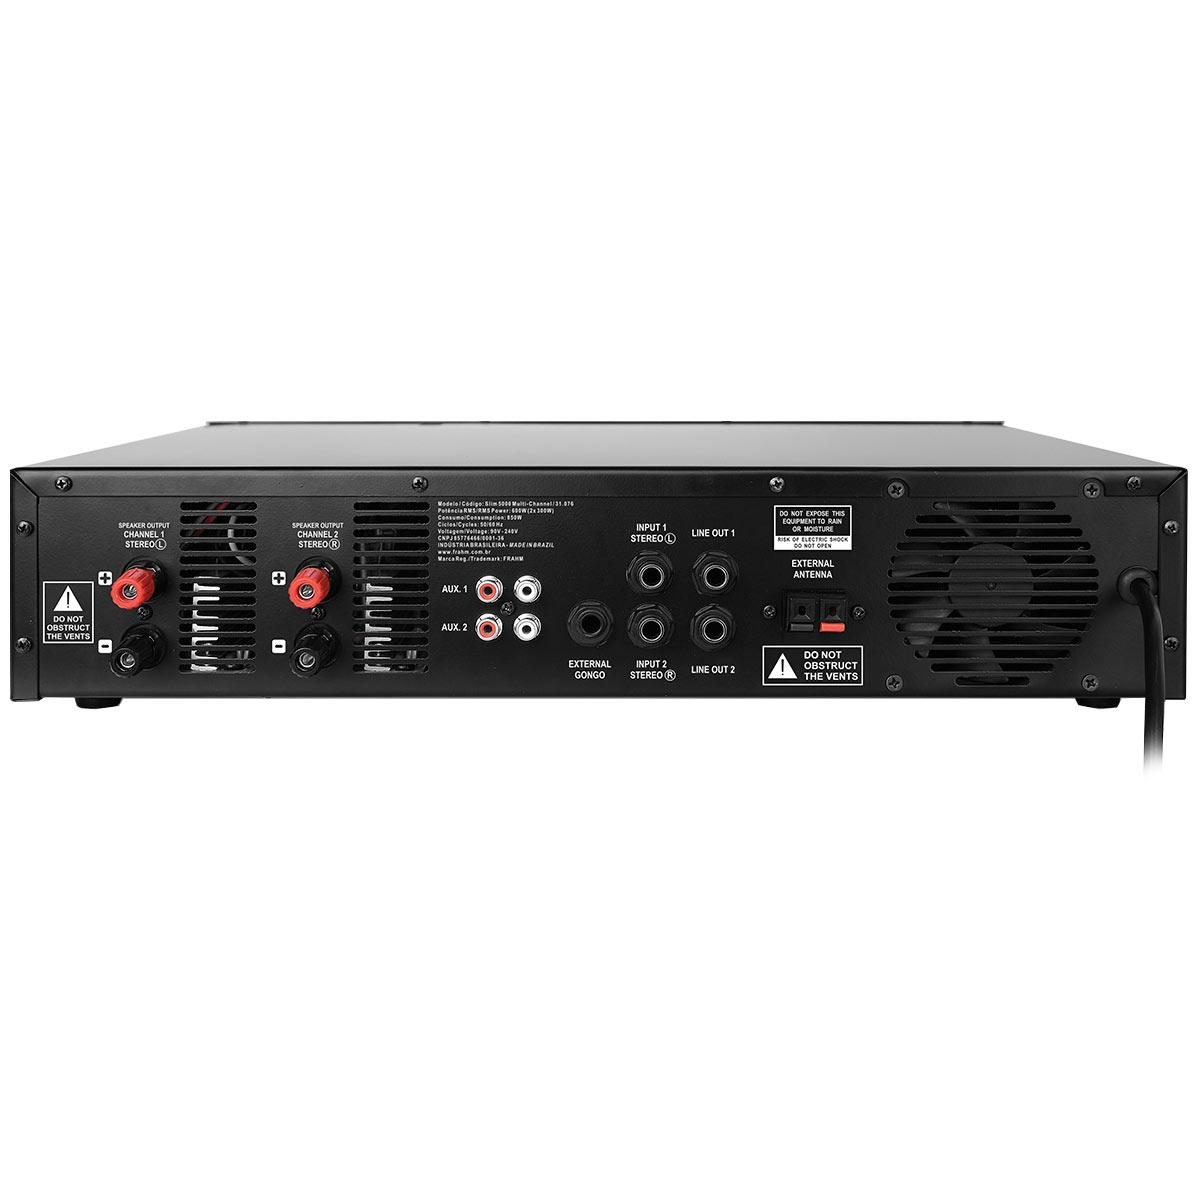 SLIM5000 - Amplificador Estéreo USB 600W SLIM 5000 - Frahm